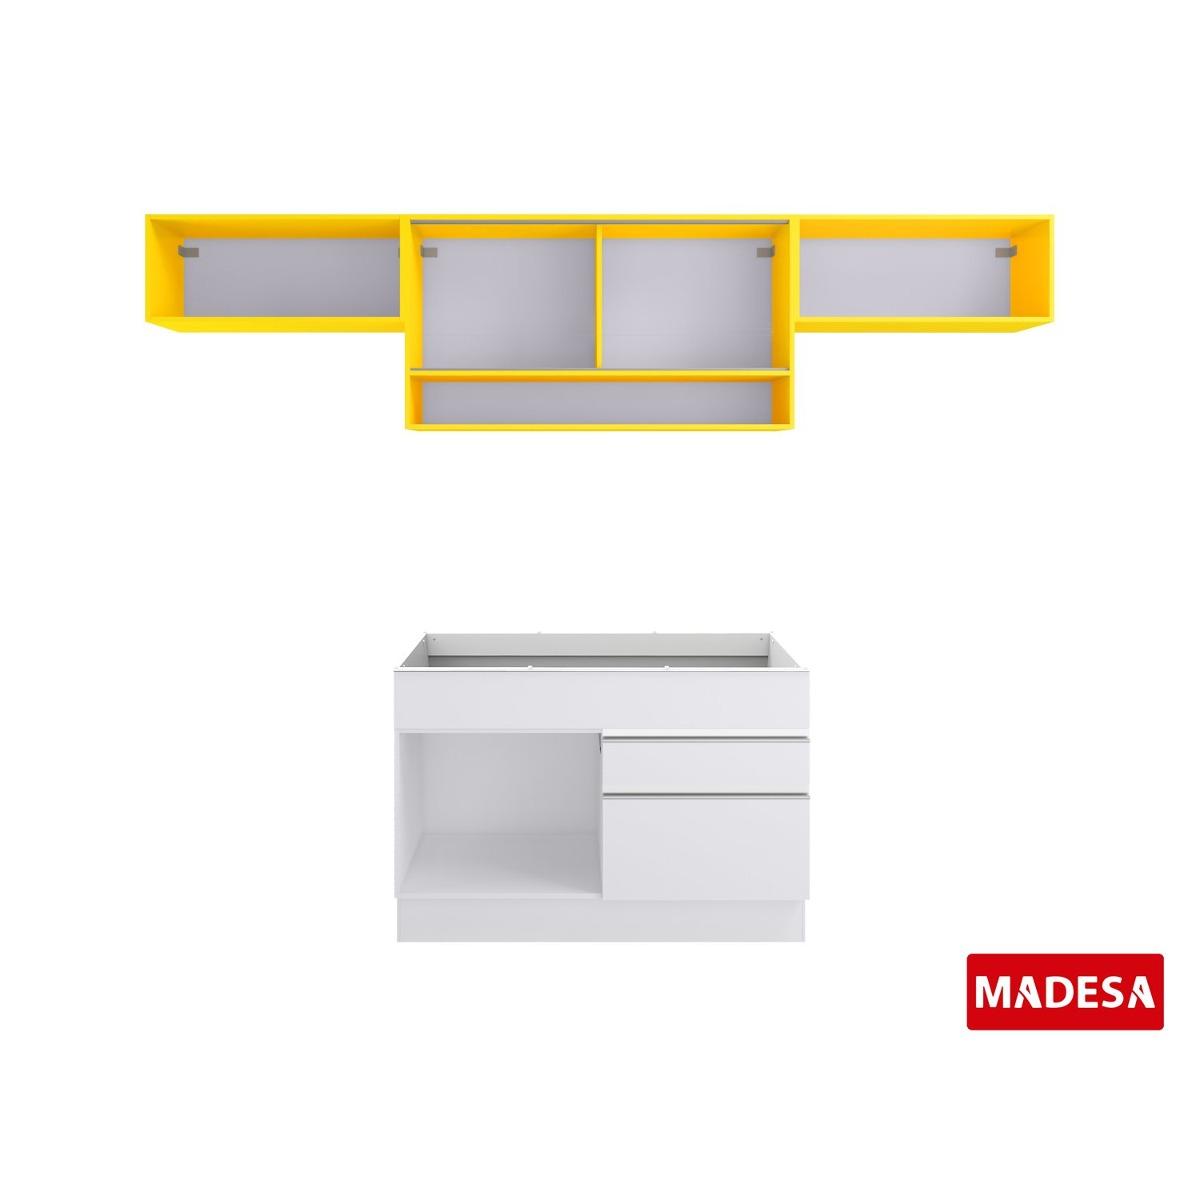 Cozinha Compacta Glamy Marina N O Acompanha Tampo E Id R 739 90